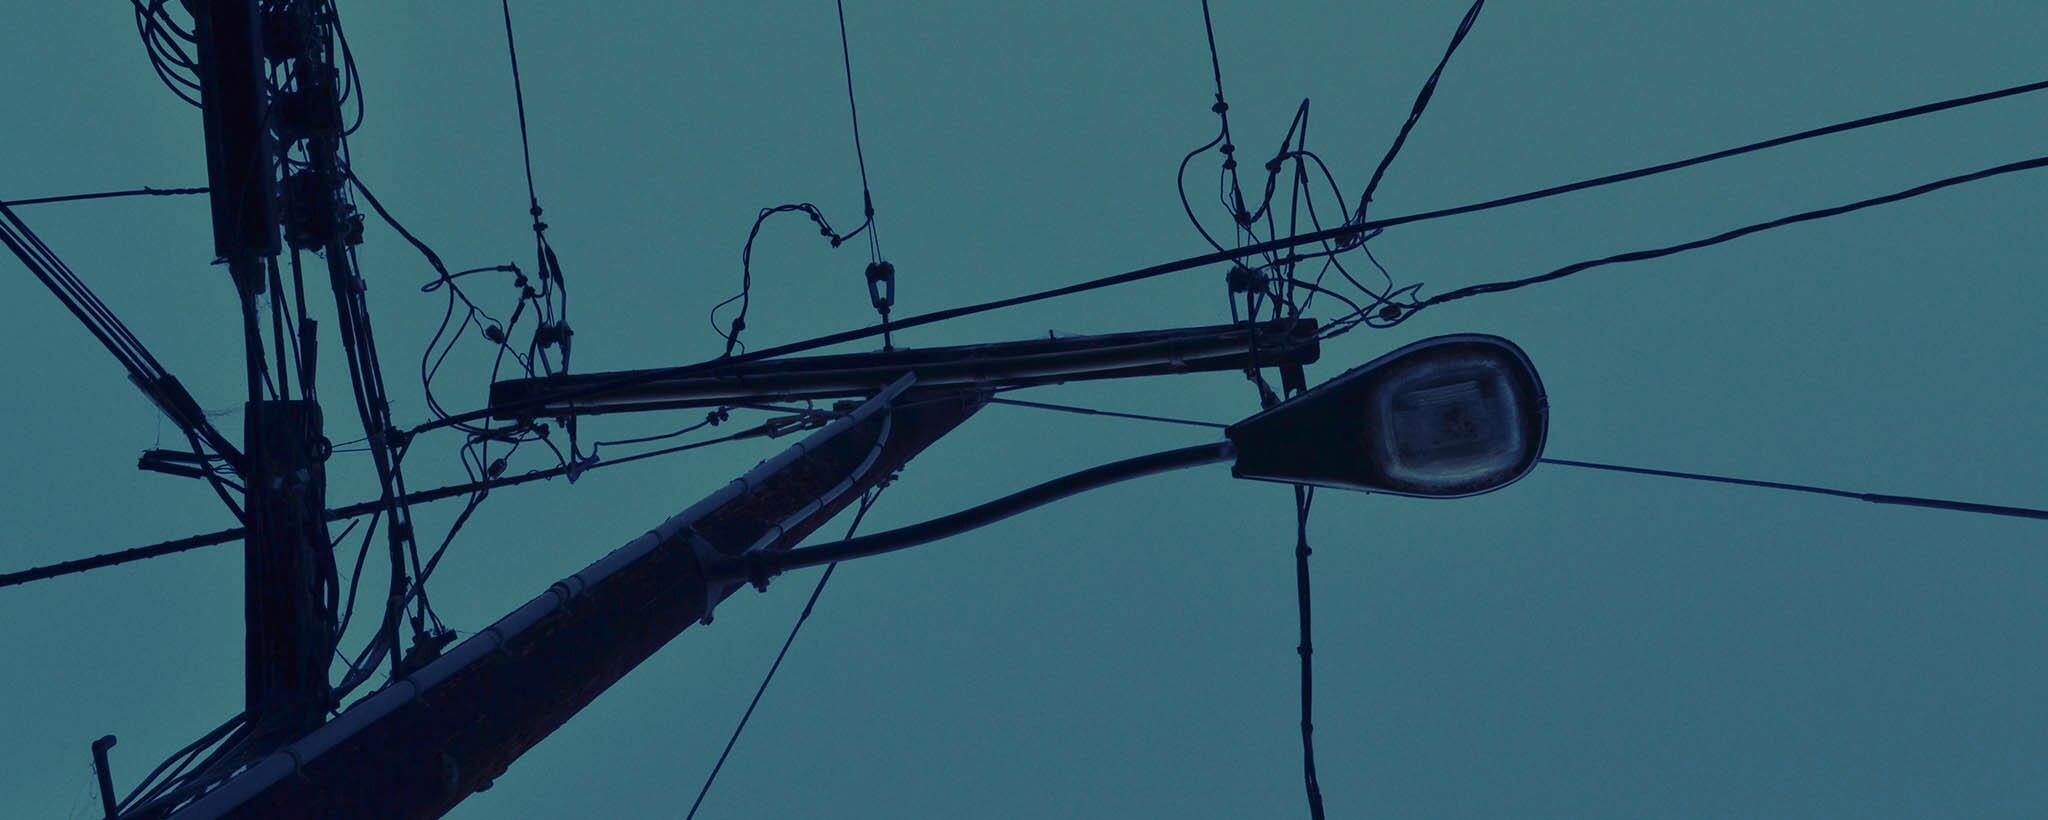 Town of Plattsmouth lost power, restored